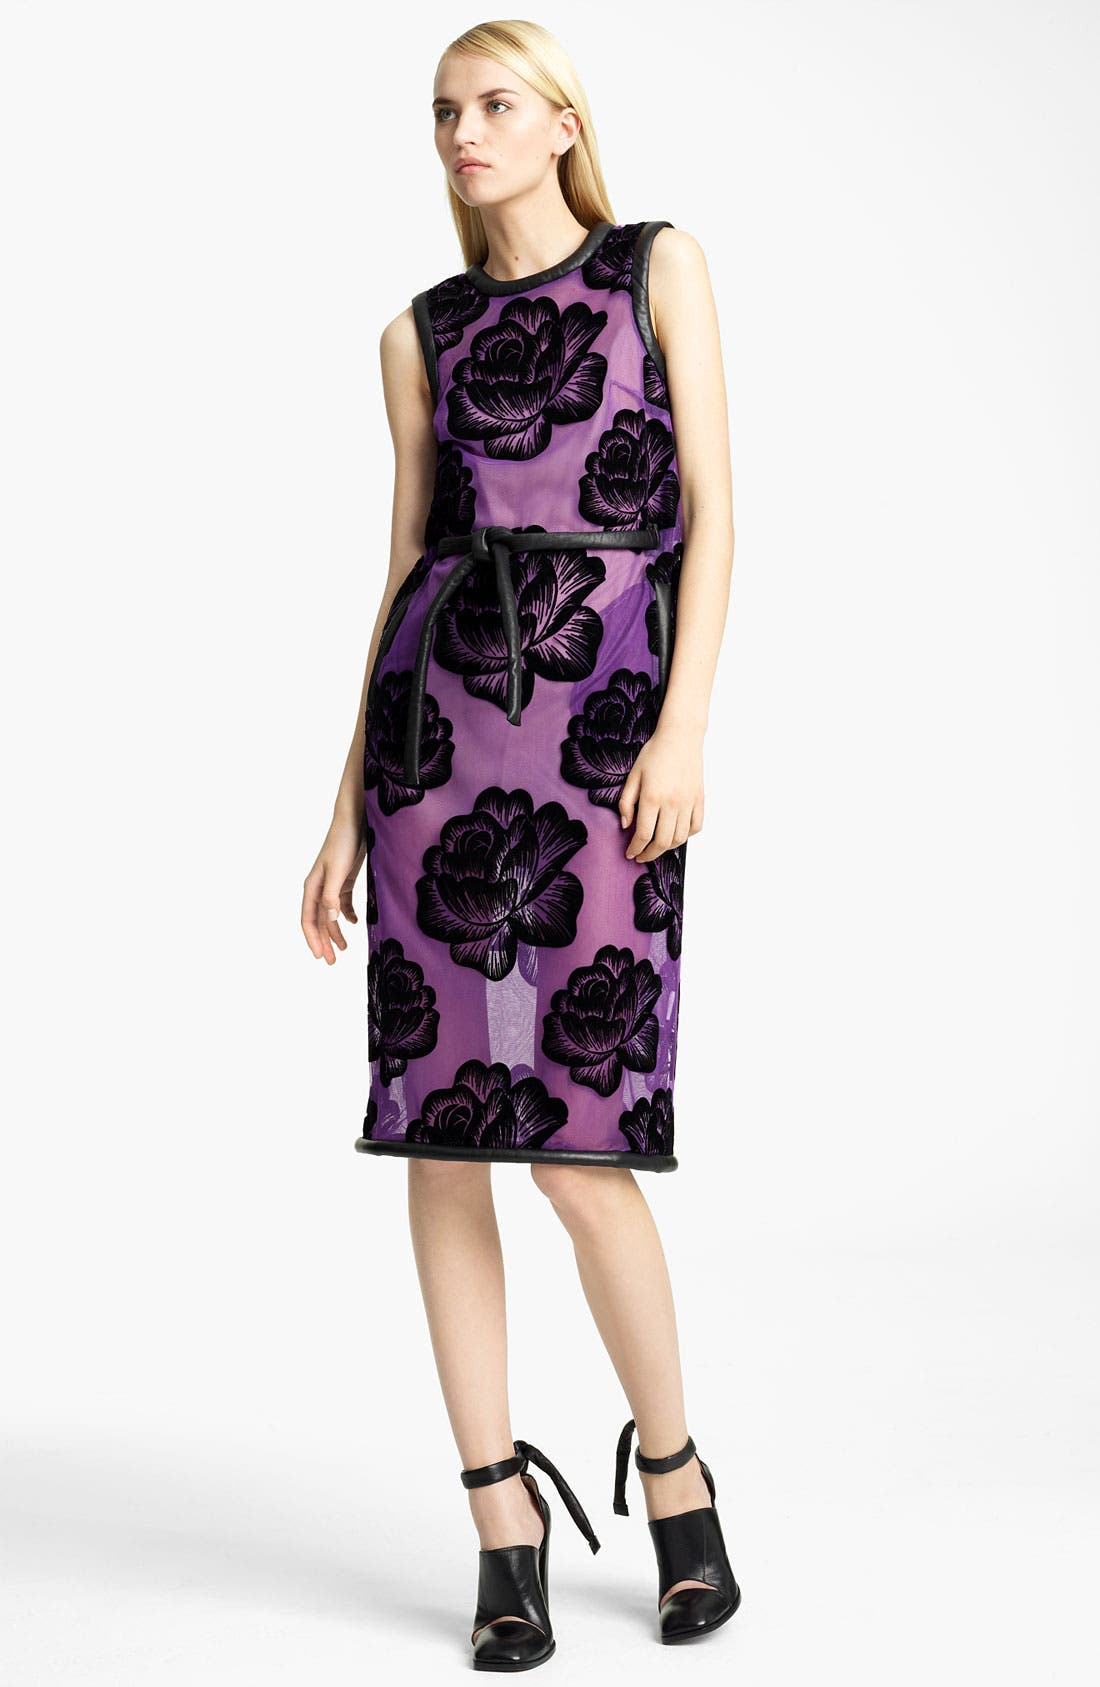 Main Image - Christopher Kane Tie Belt Rose Tulle Dress